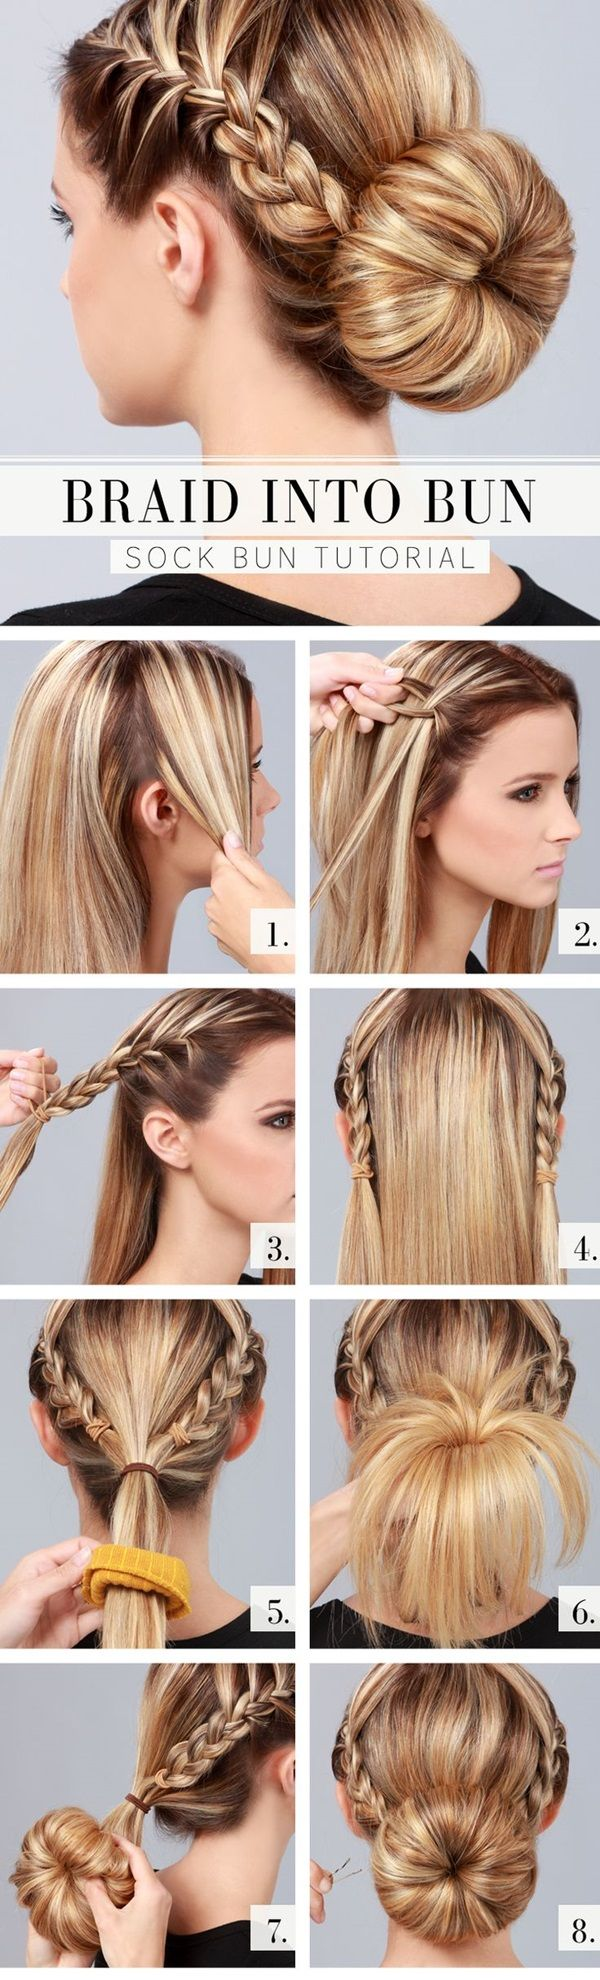 Strange 1000 Ideas About Diy Hairstyles On Pinterest Easy Diy Short Hairstyles For Black Women Fulllsitofus